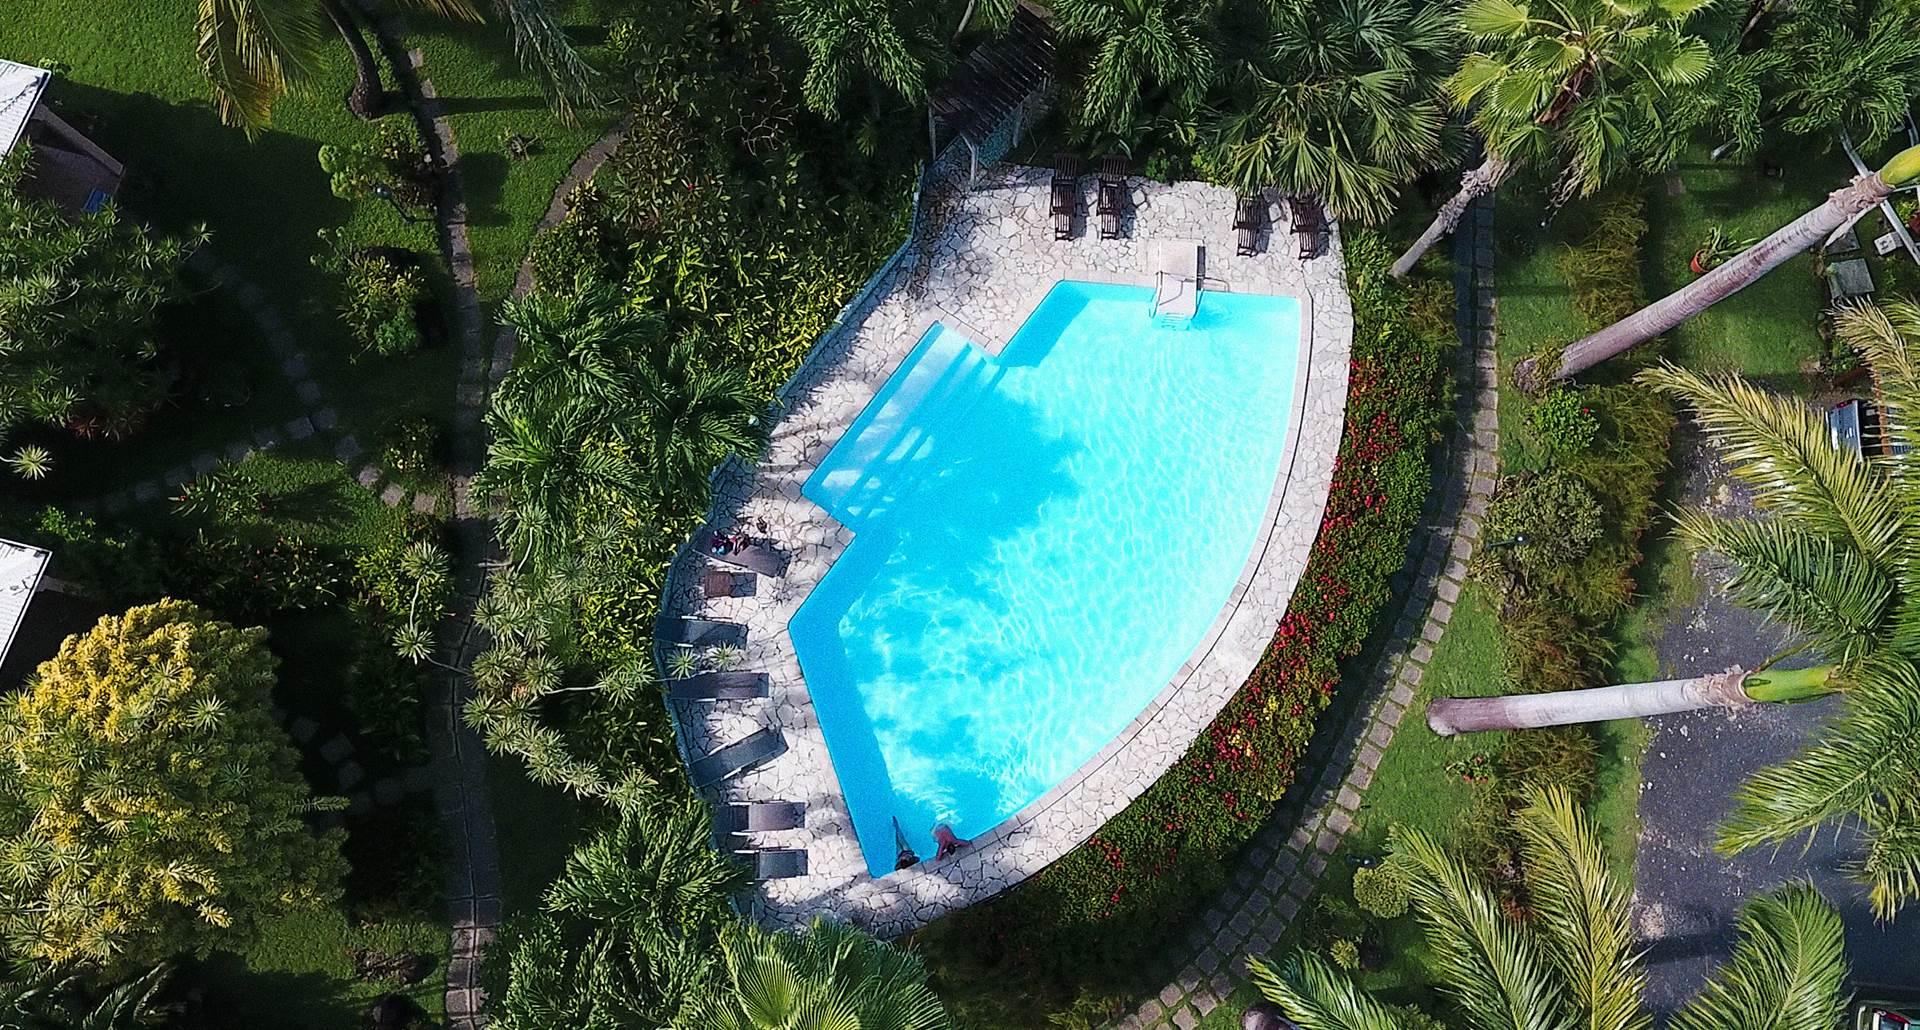 piscine vue du drone